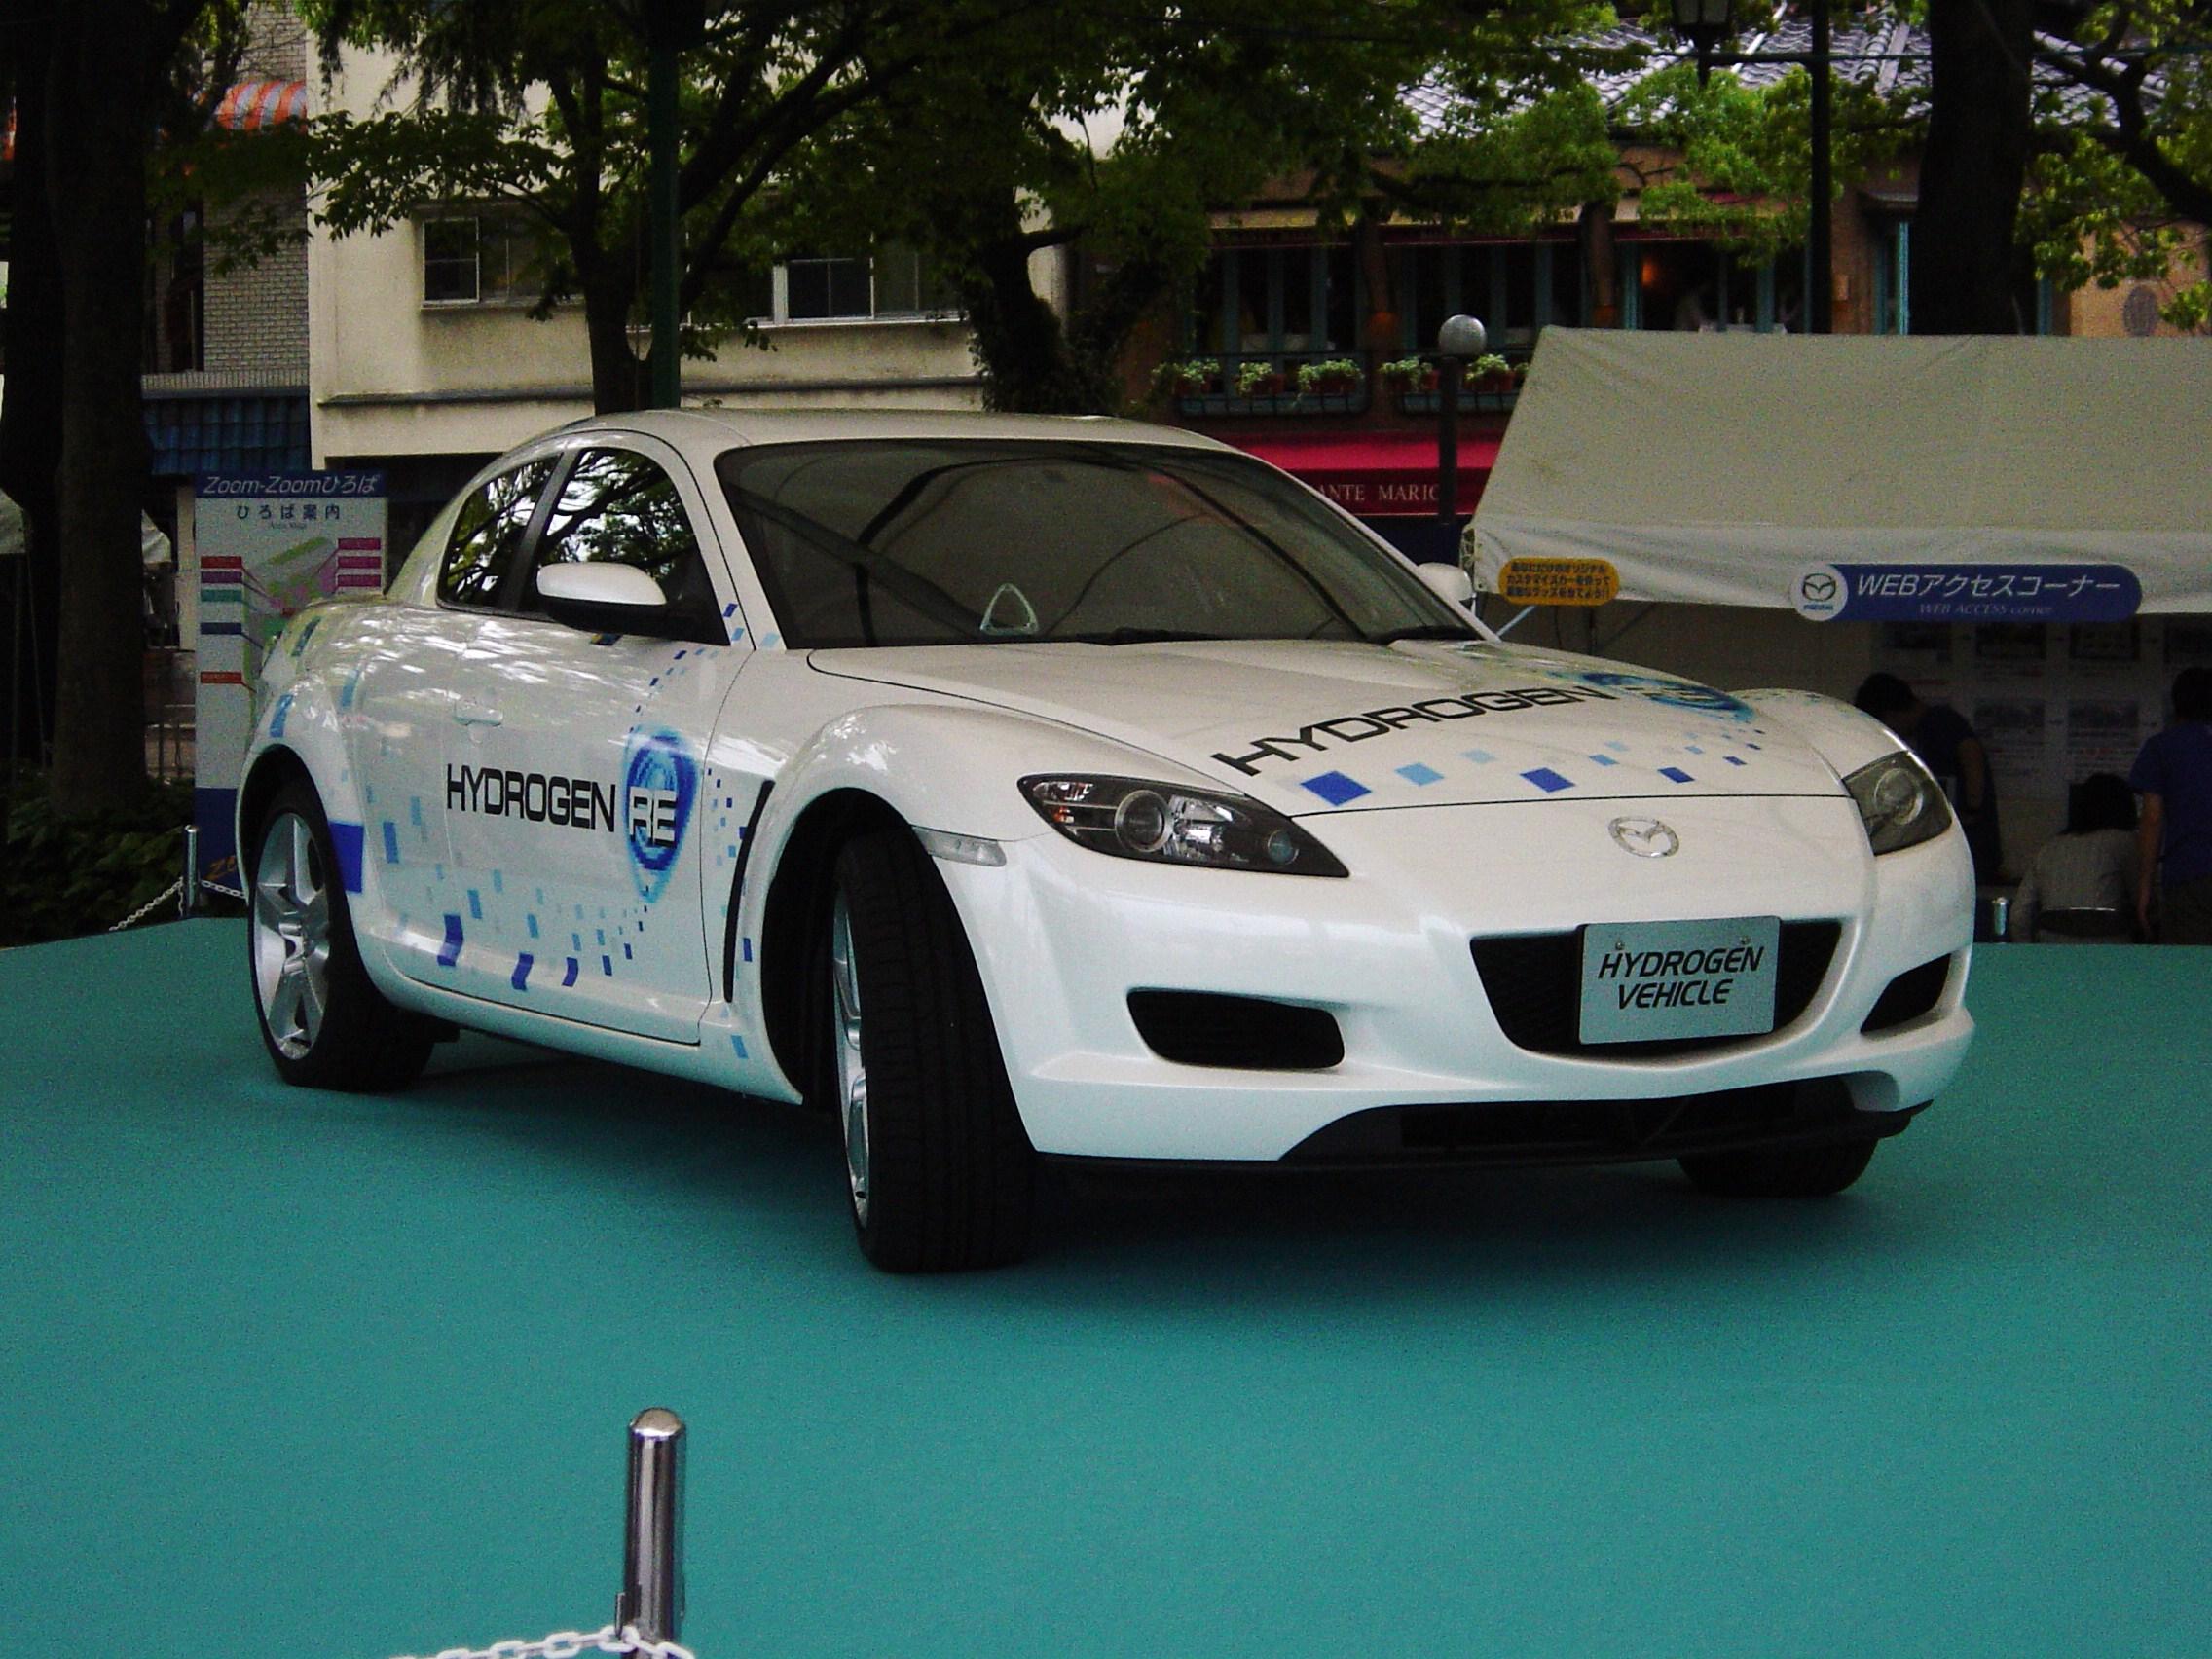 Hydrogen internal combustion engine vehicle - Wikipedia